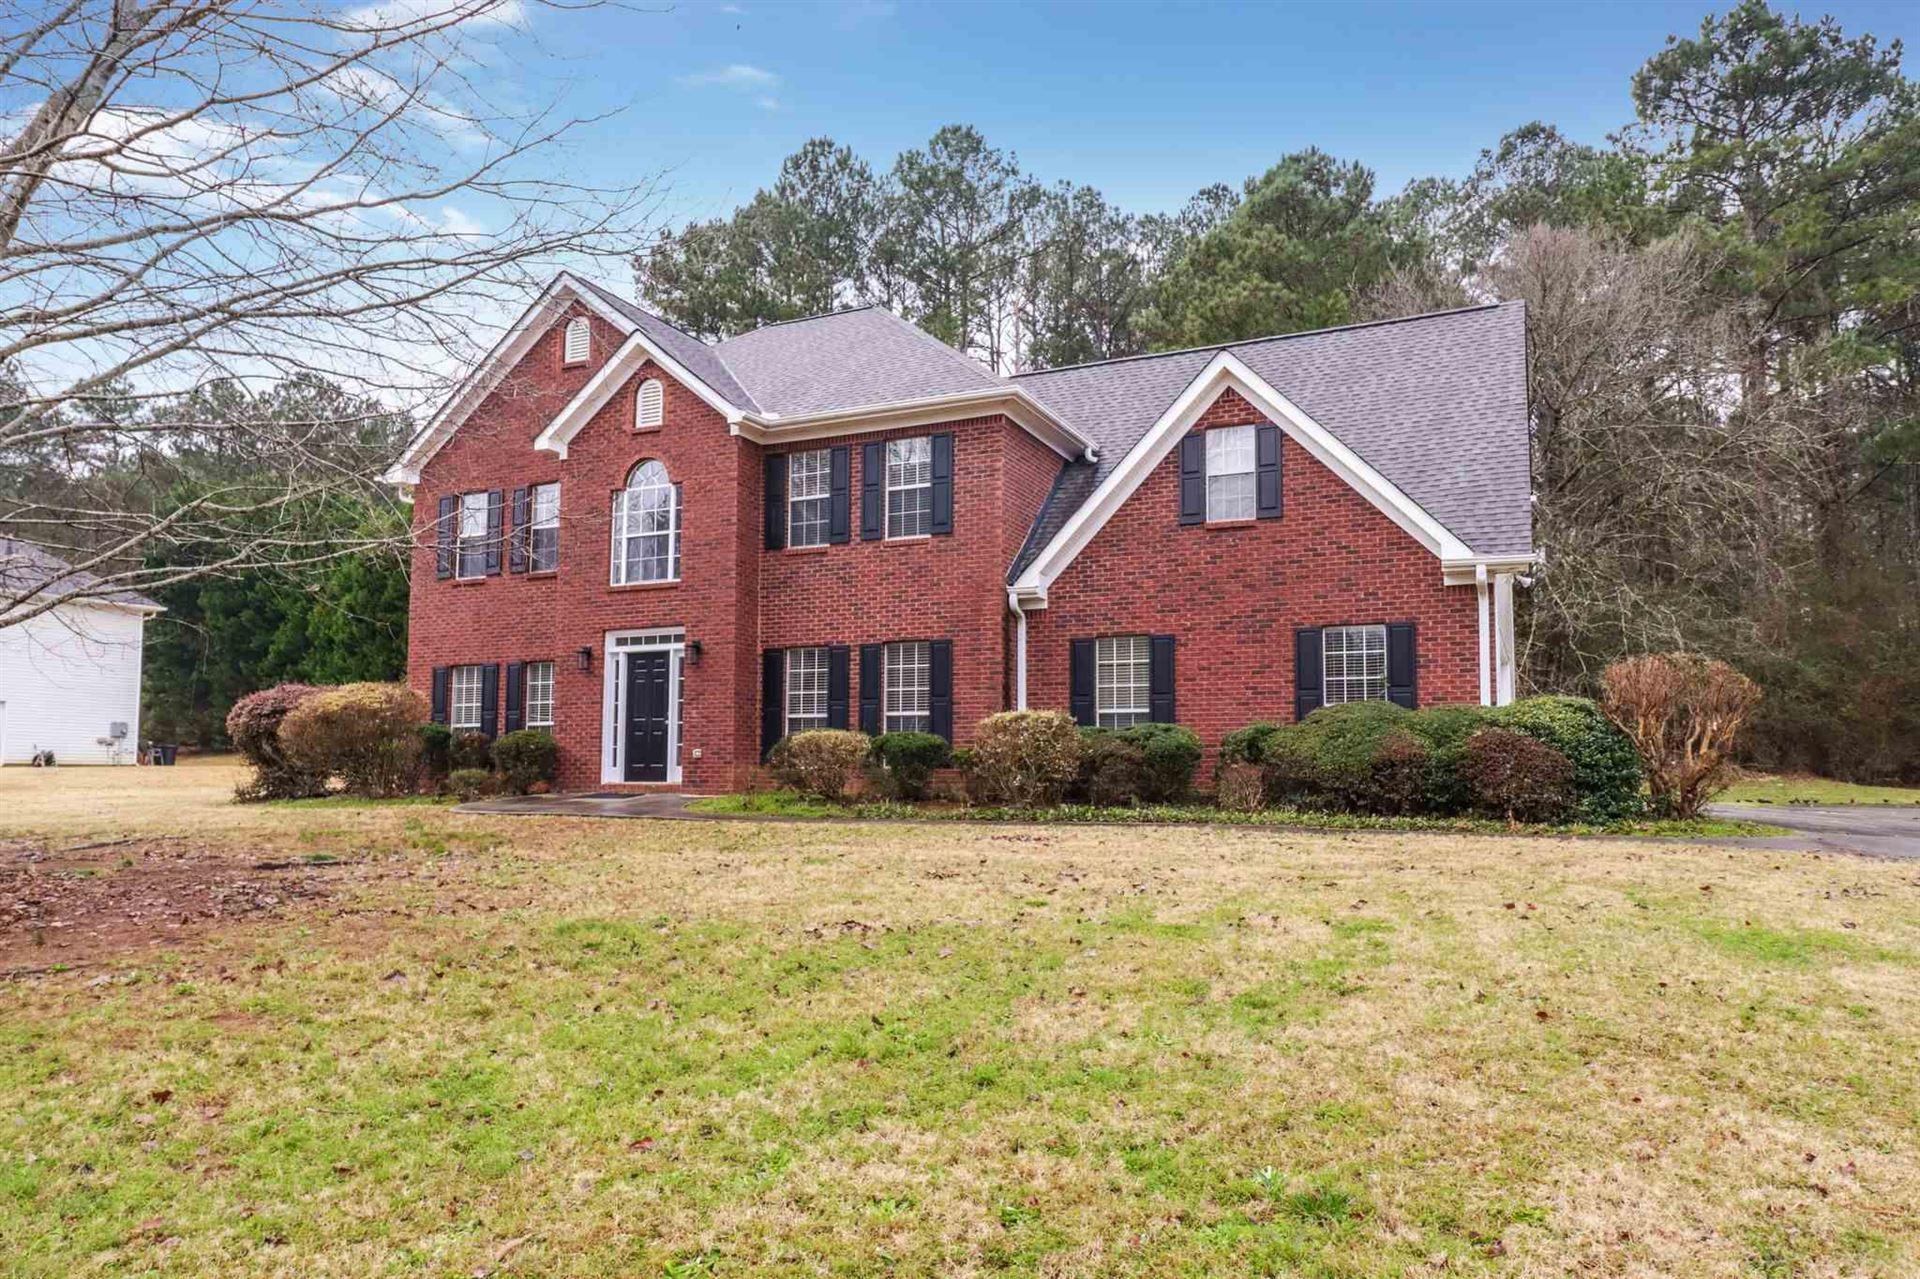 185 Edmondson Way, Fayetteville, GA 30214 - #: 8911918